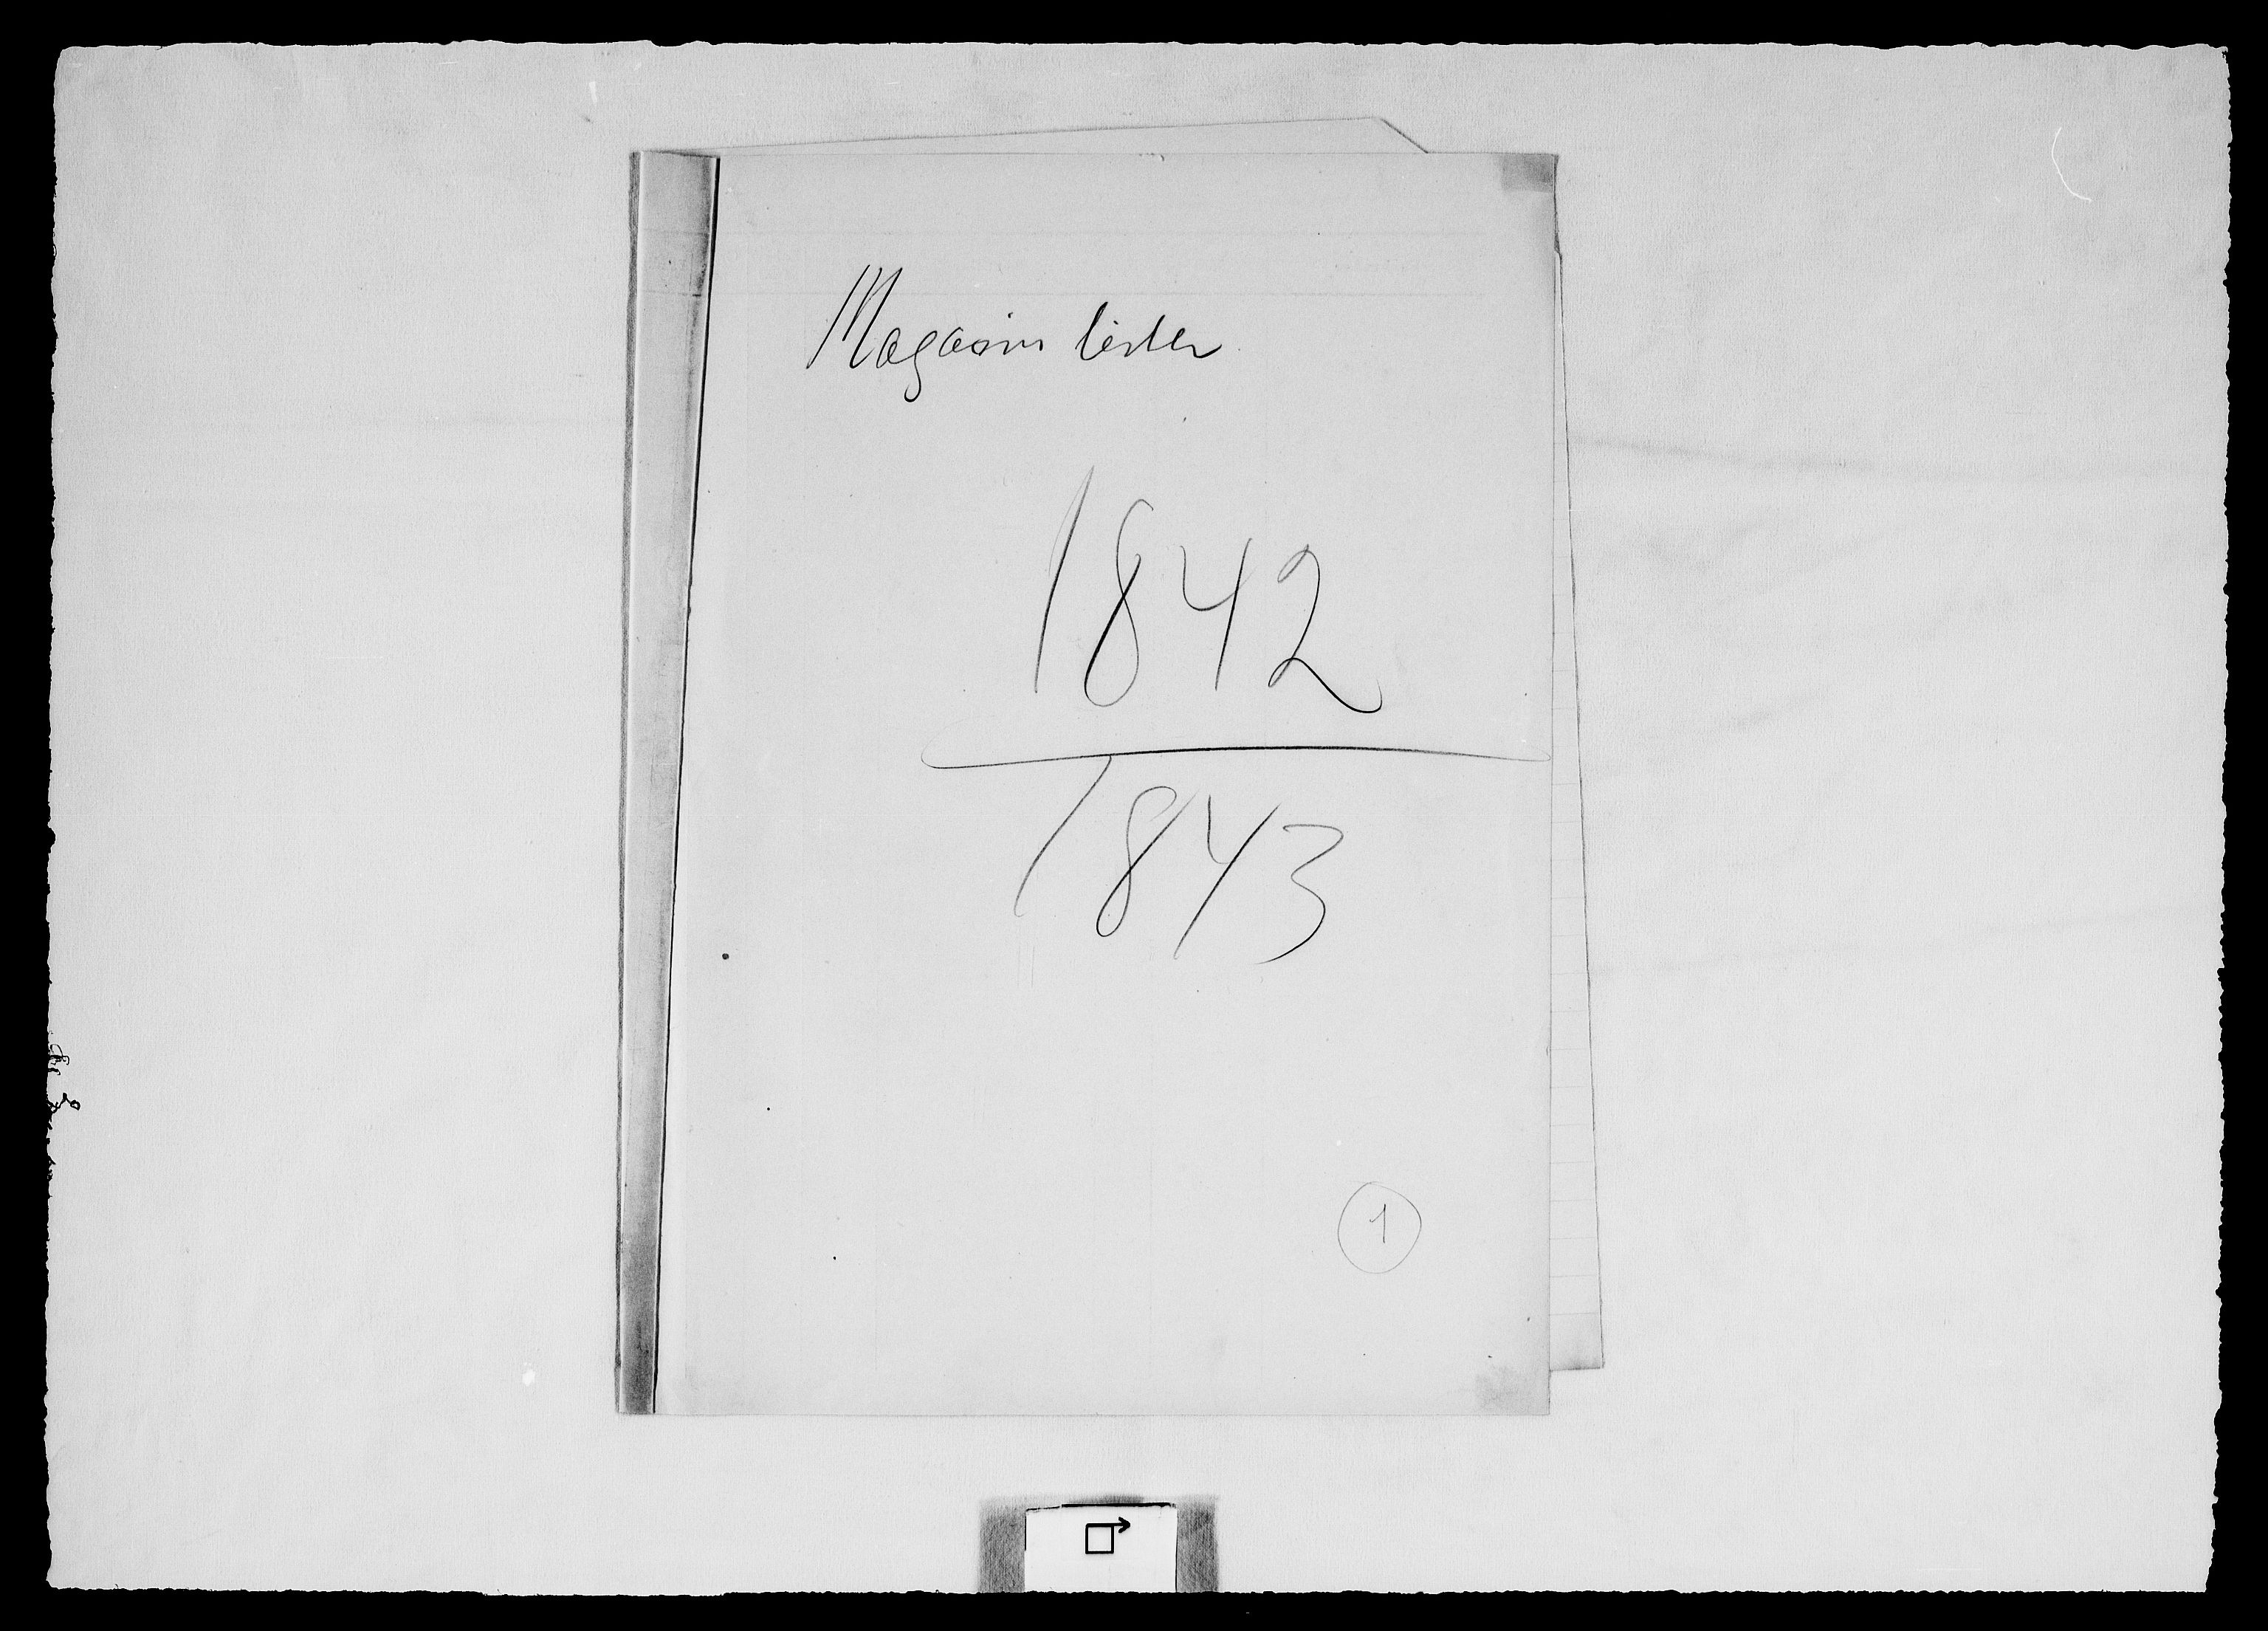 RA, Modums Blaafarveværk, G/Gd/Gdd/L0306, 1842-1846, s. 2